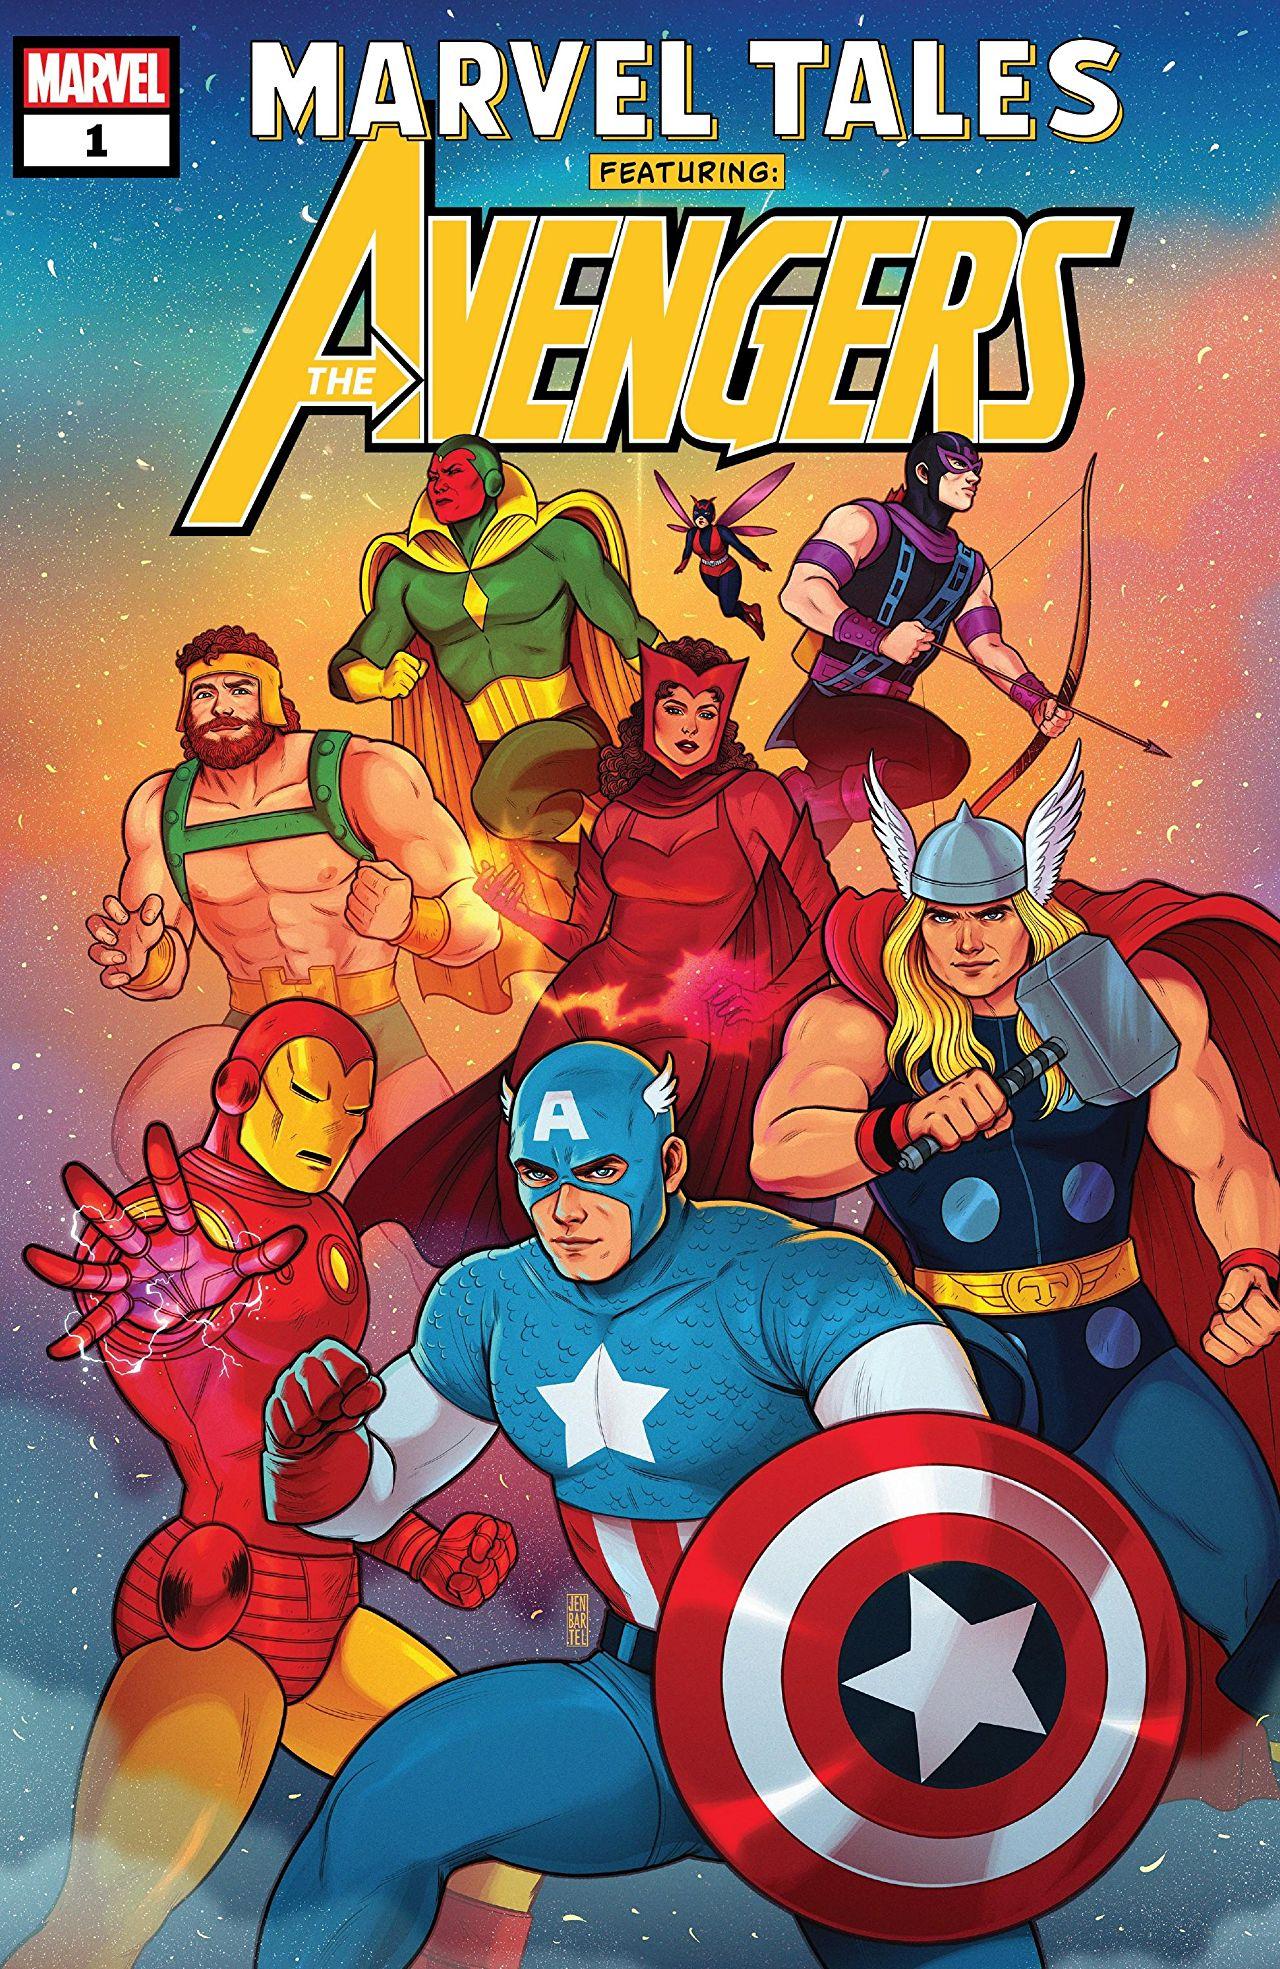 Avengers #264   Mr Fantastic   Invisible Woman  1st Yellowjacket   John Buscema